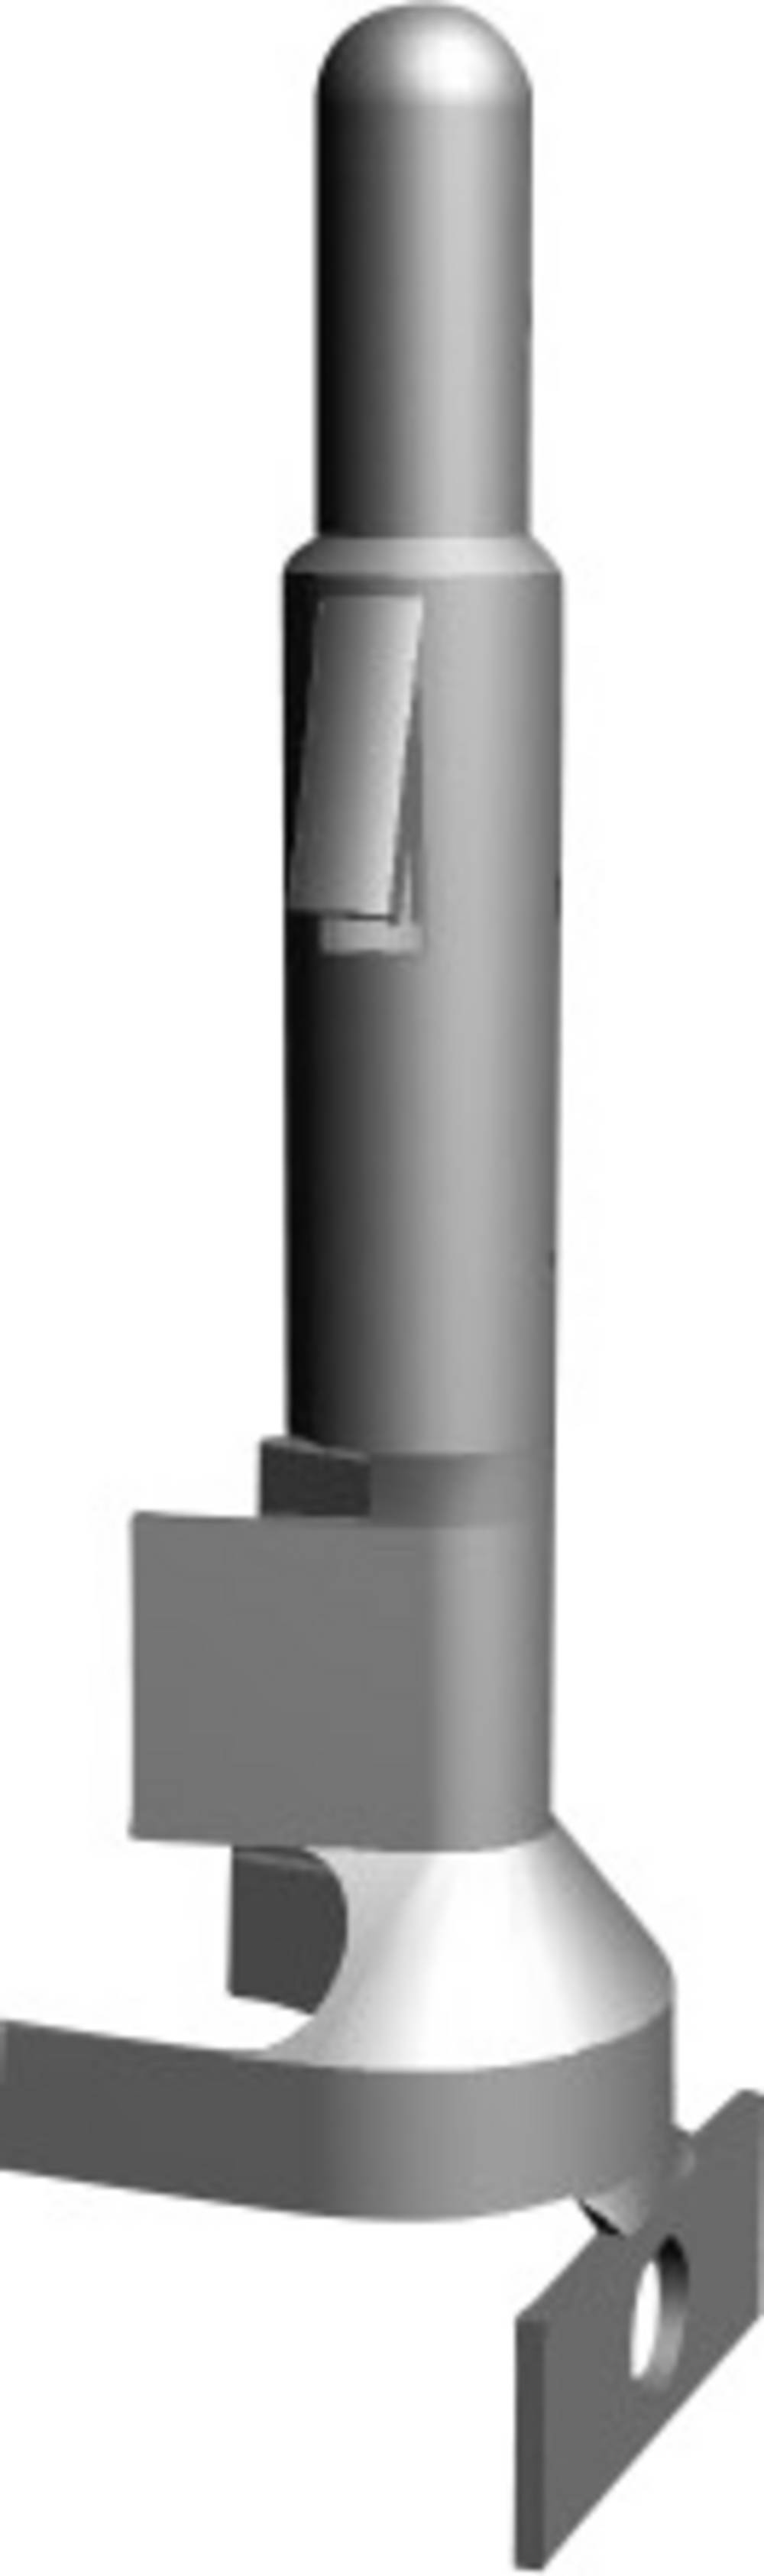 Crimpkontakter Universal-MATE-N-LOK Samlet antal poler 1 TE Connectivity 926900-3 1 stk